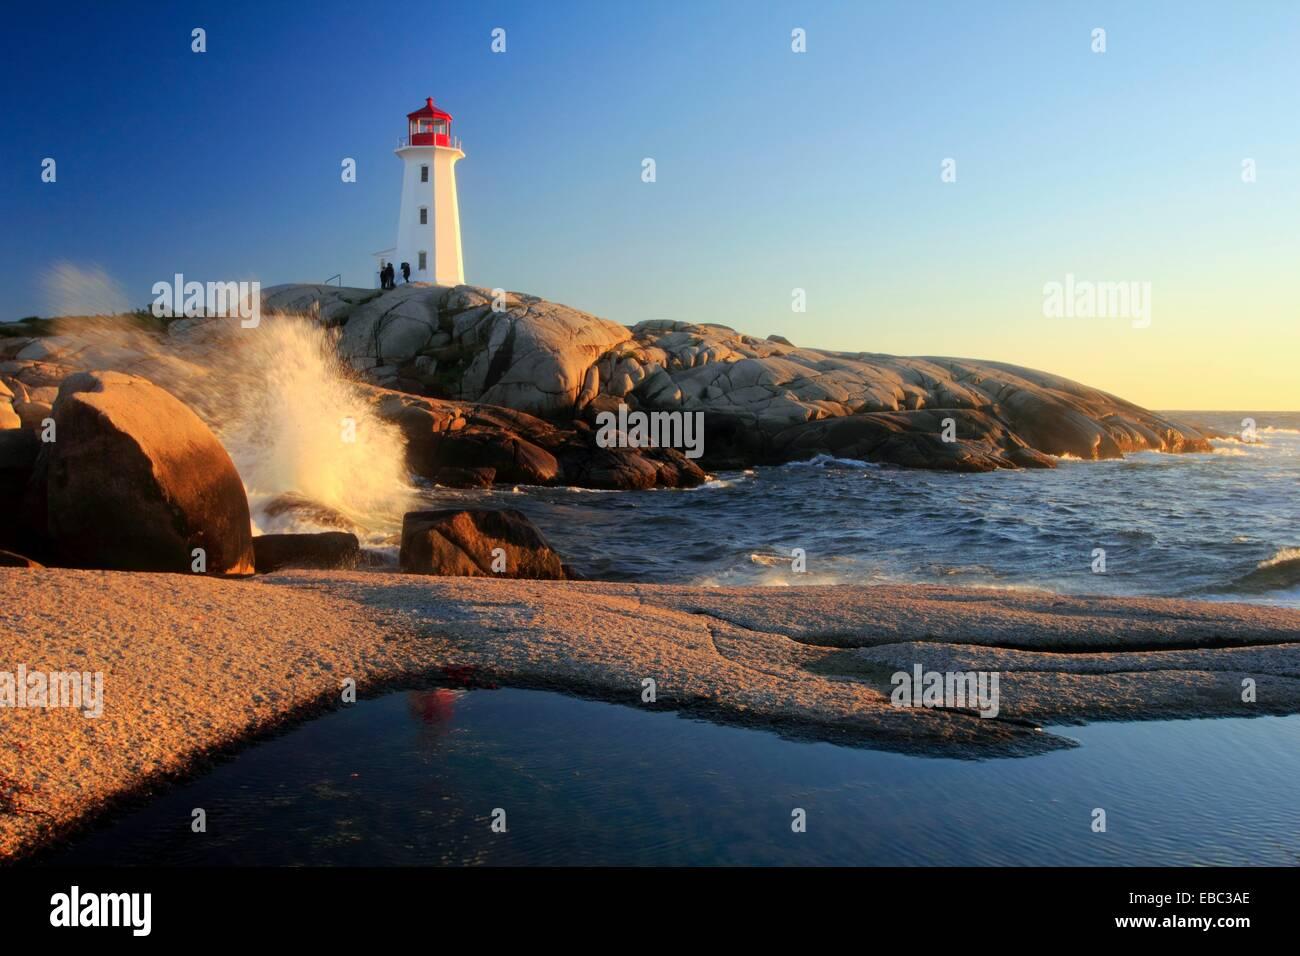 waves crashing on rocks at Peggy´s Cove Lighthouse, Nova Scotia, Canada Stock Photo